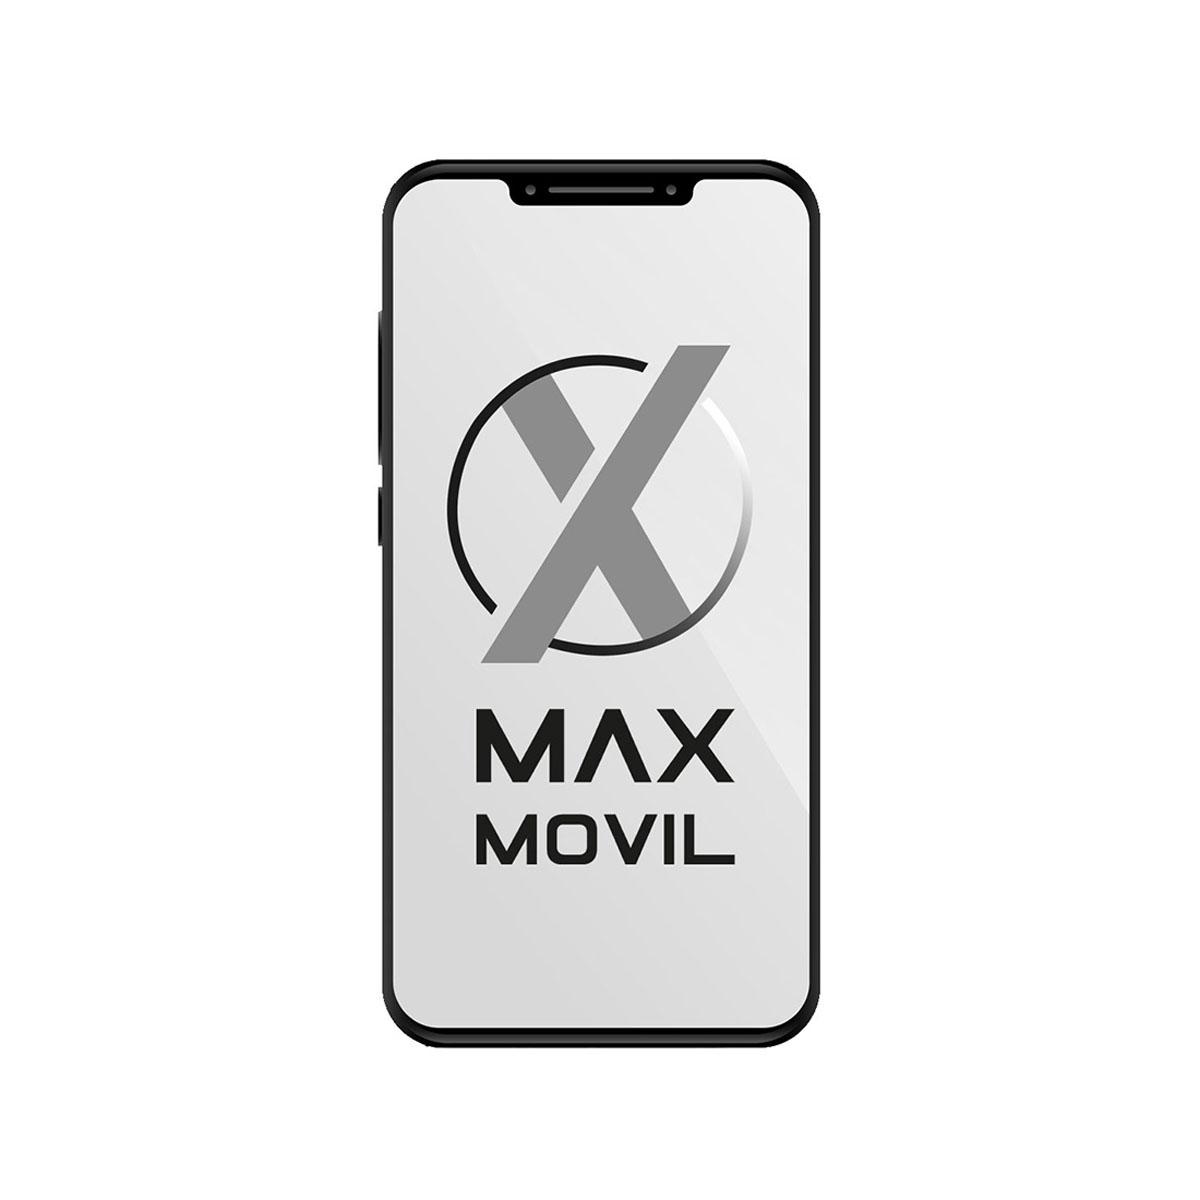 Adaptador cable para cargador Motorola V3/V3x